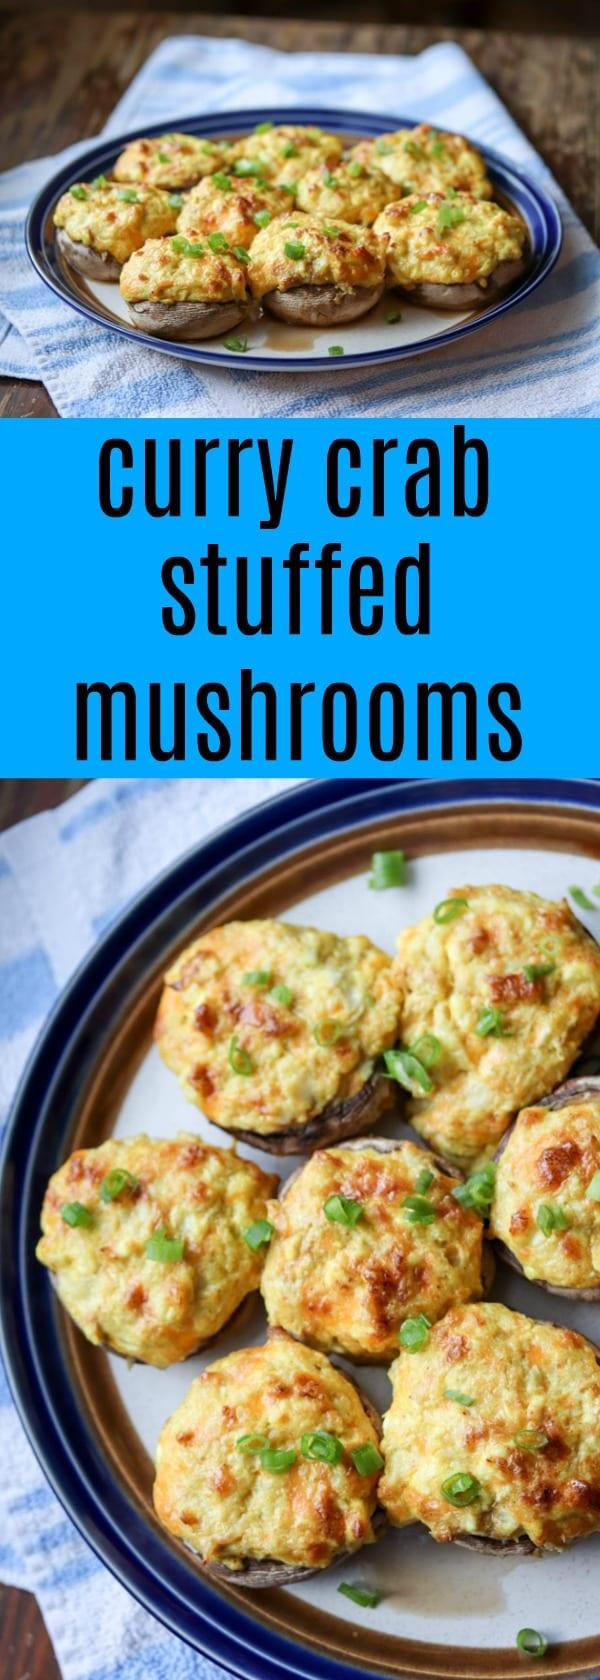 Curry Crab Stuffed Mushrooms